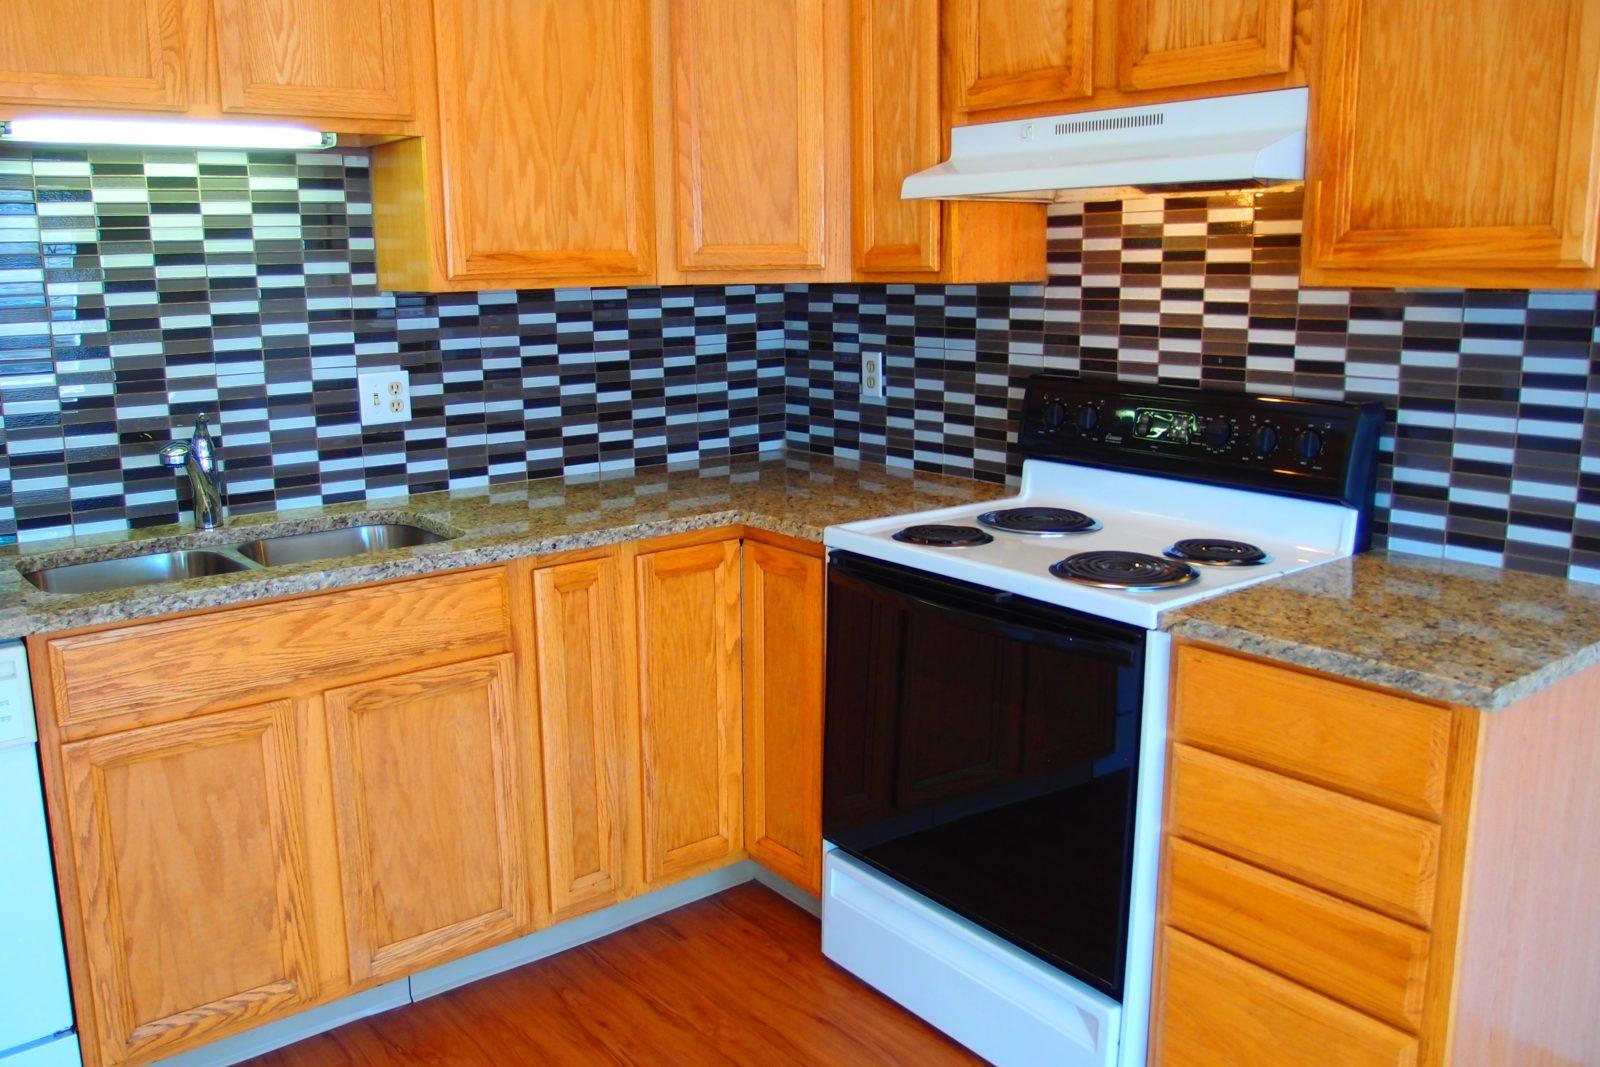 Granite Counter and Tile Backsplash